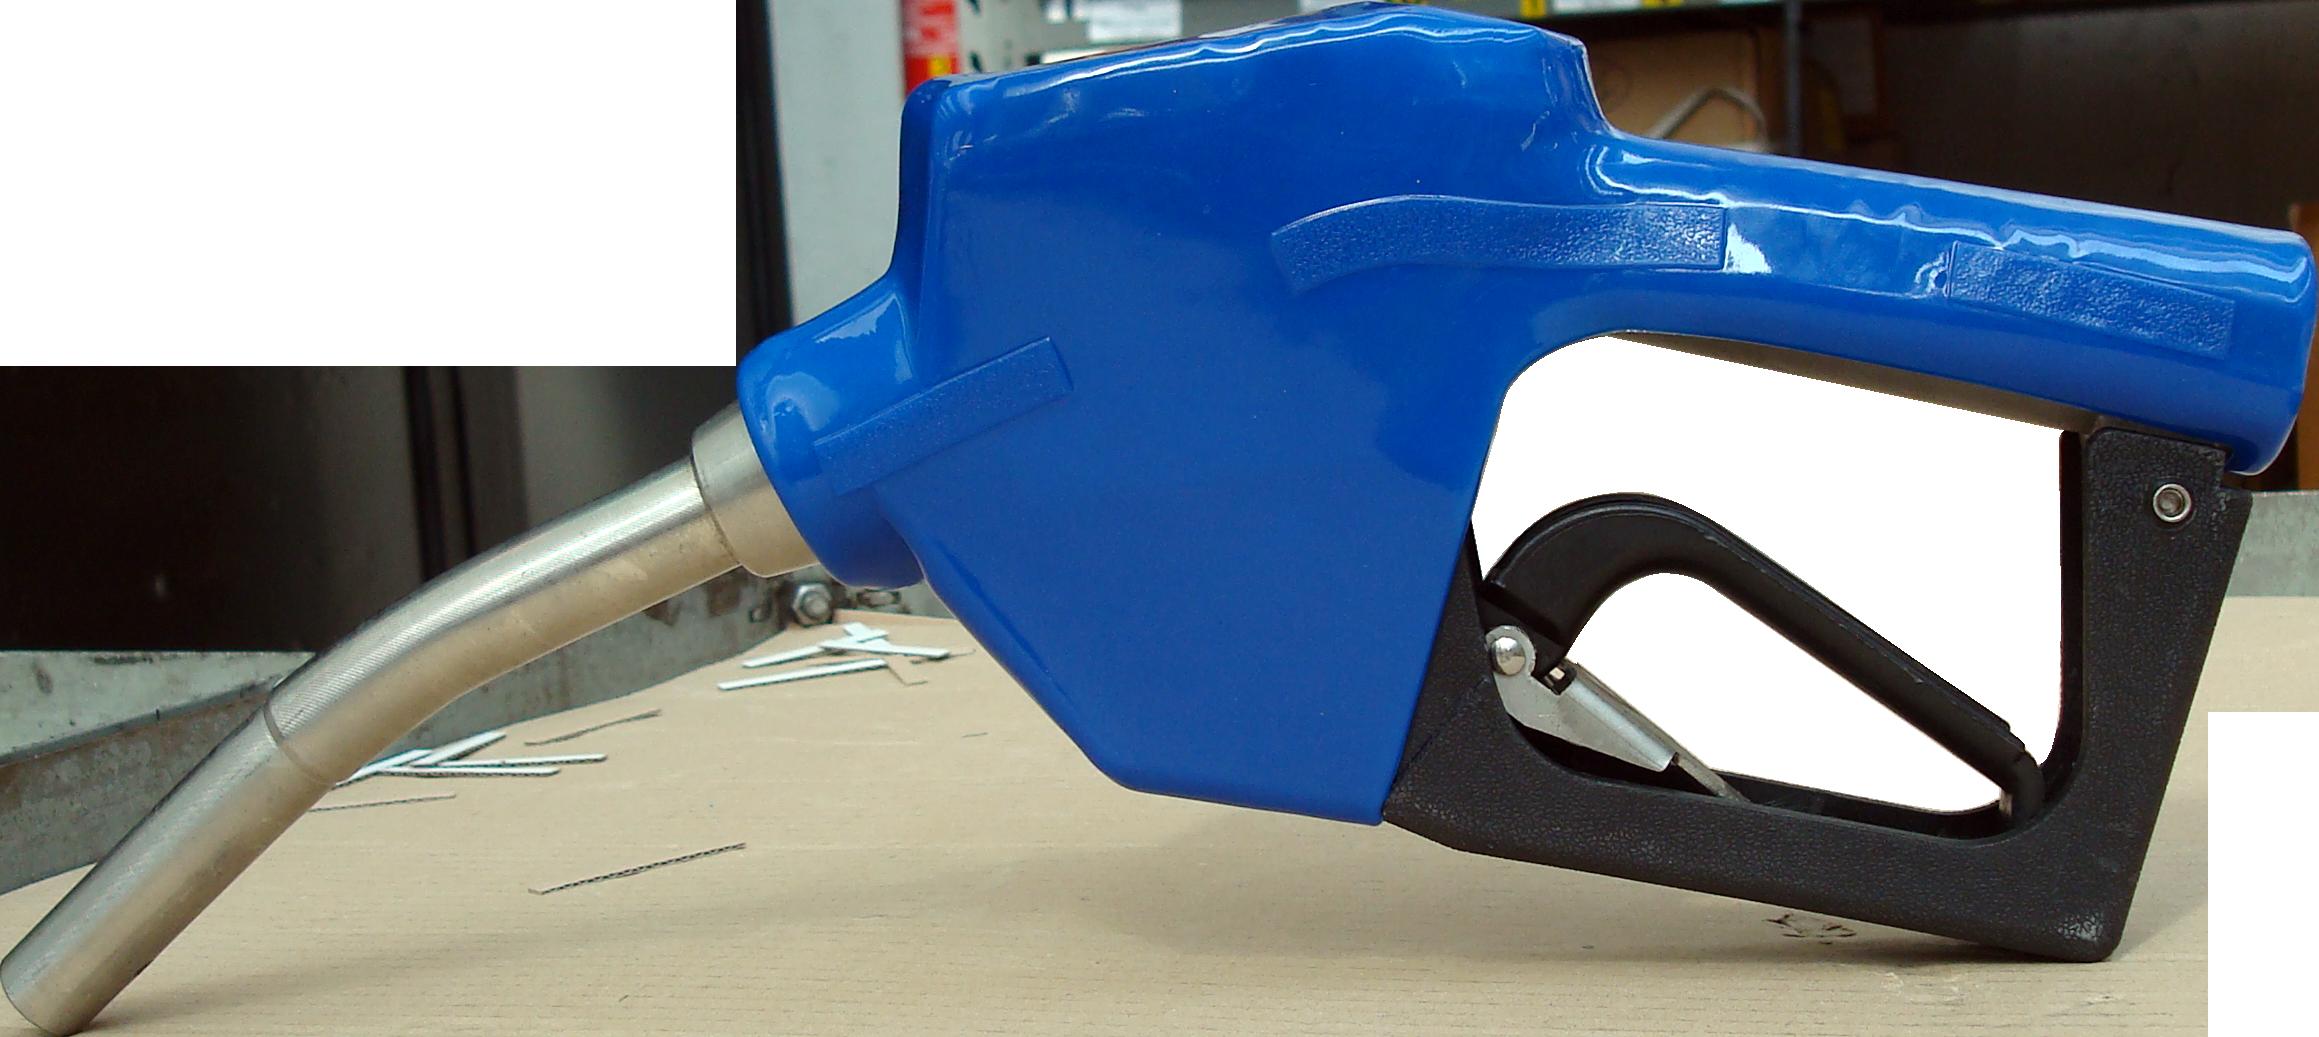 Nozzle handmatige afslag ad-blue